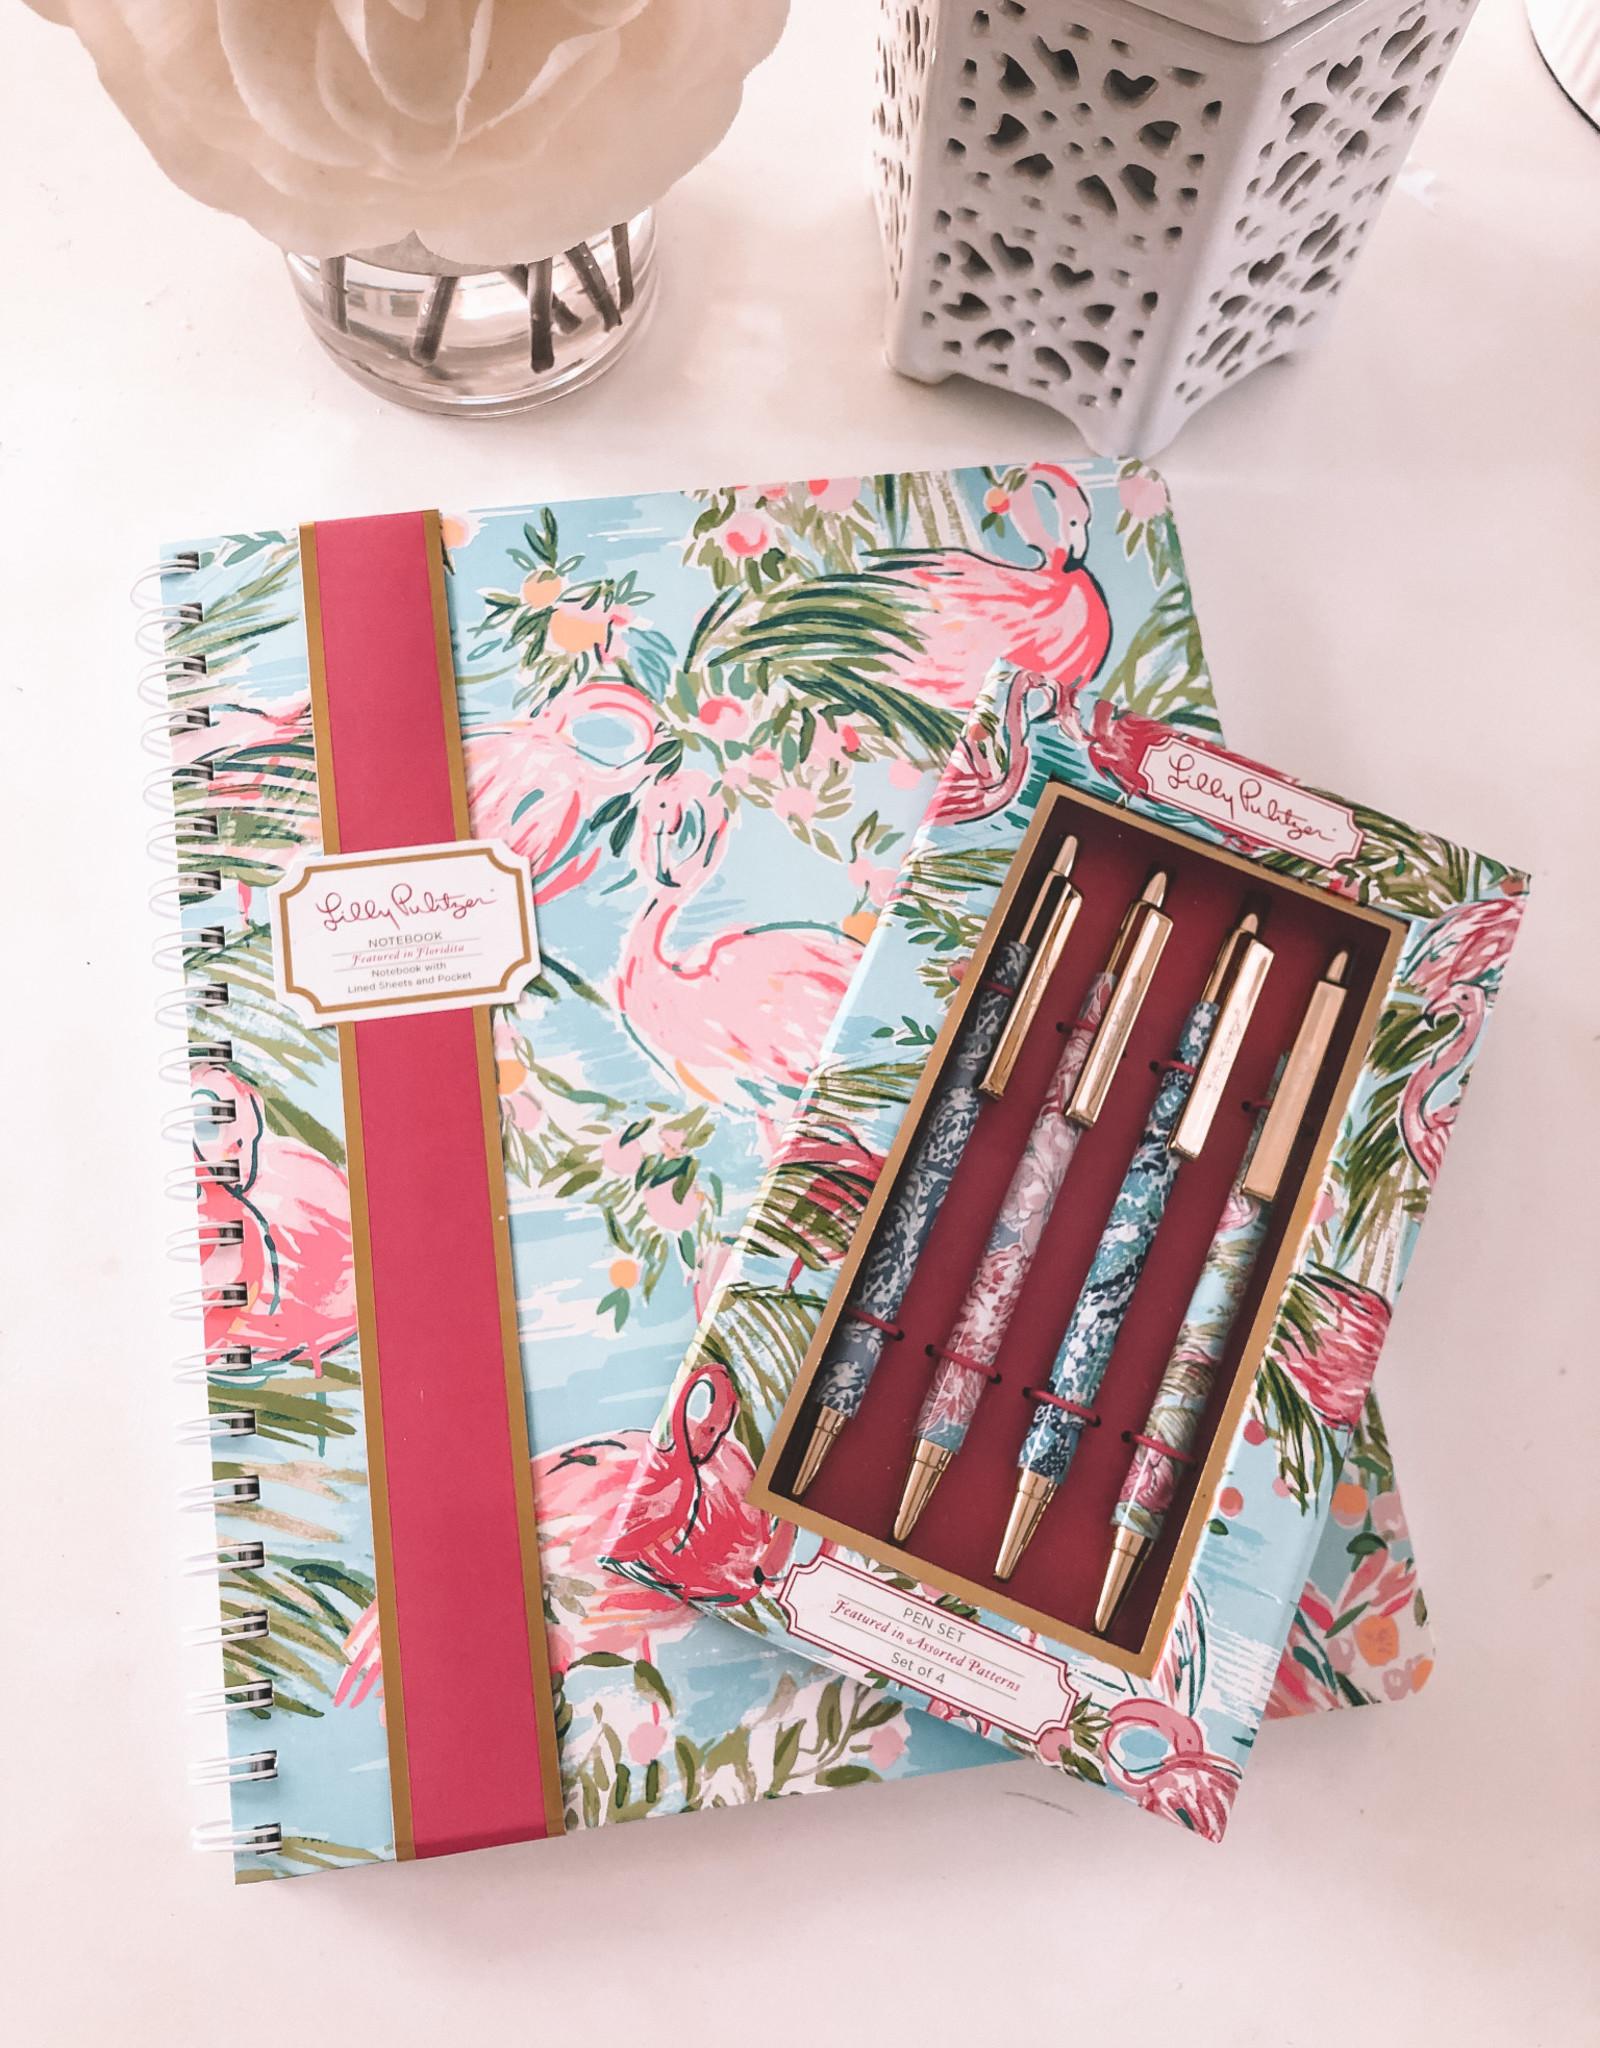 Lilly Lovin' Pen & Notebook Gift Set